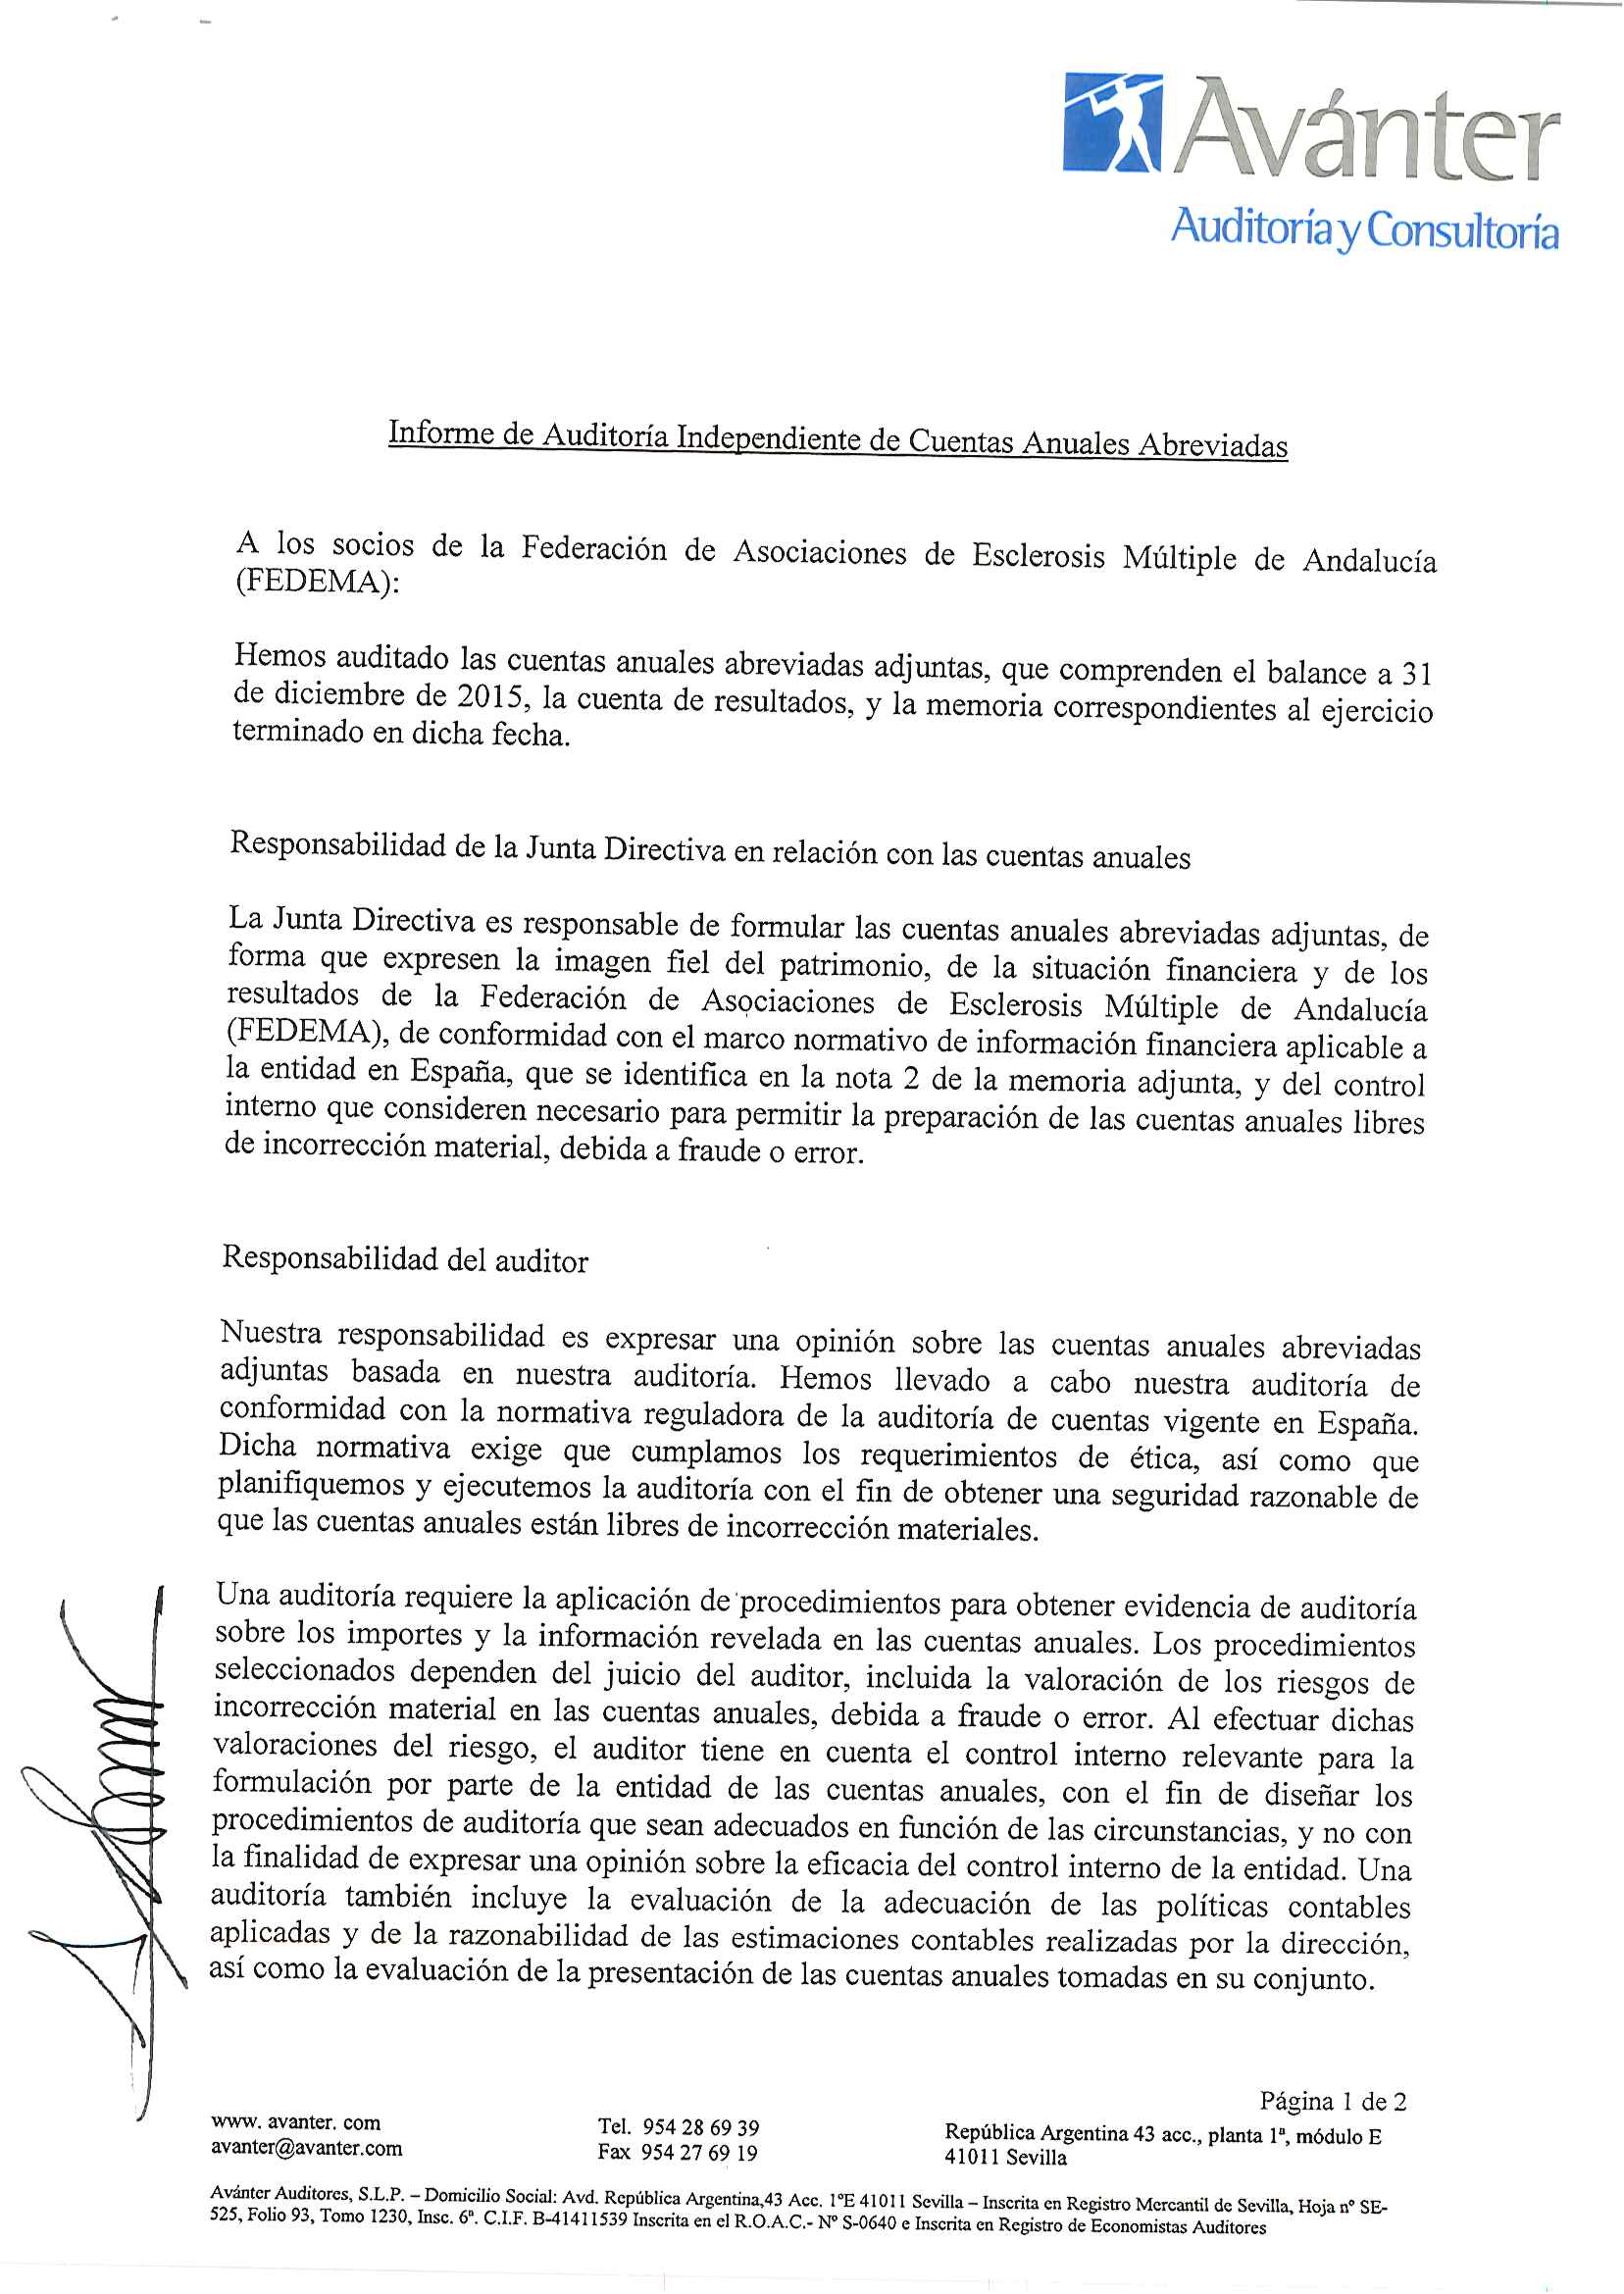 certificado auditoria fedema 2015_pagina_1.jpg